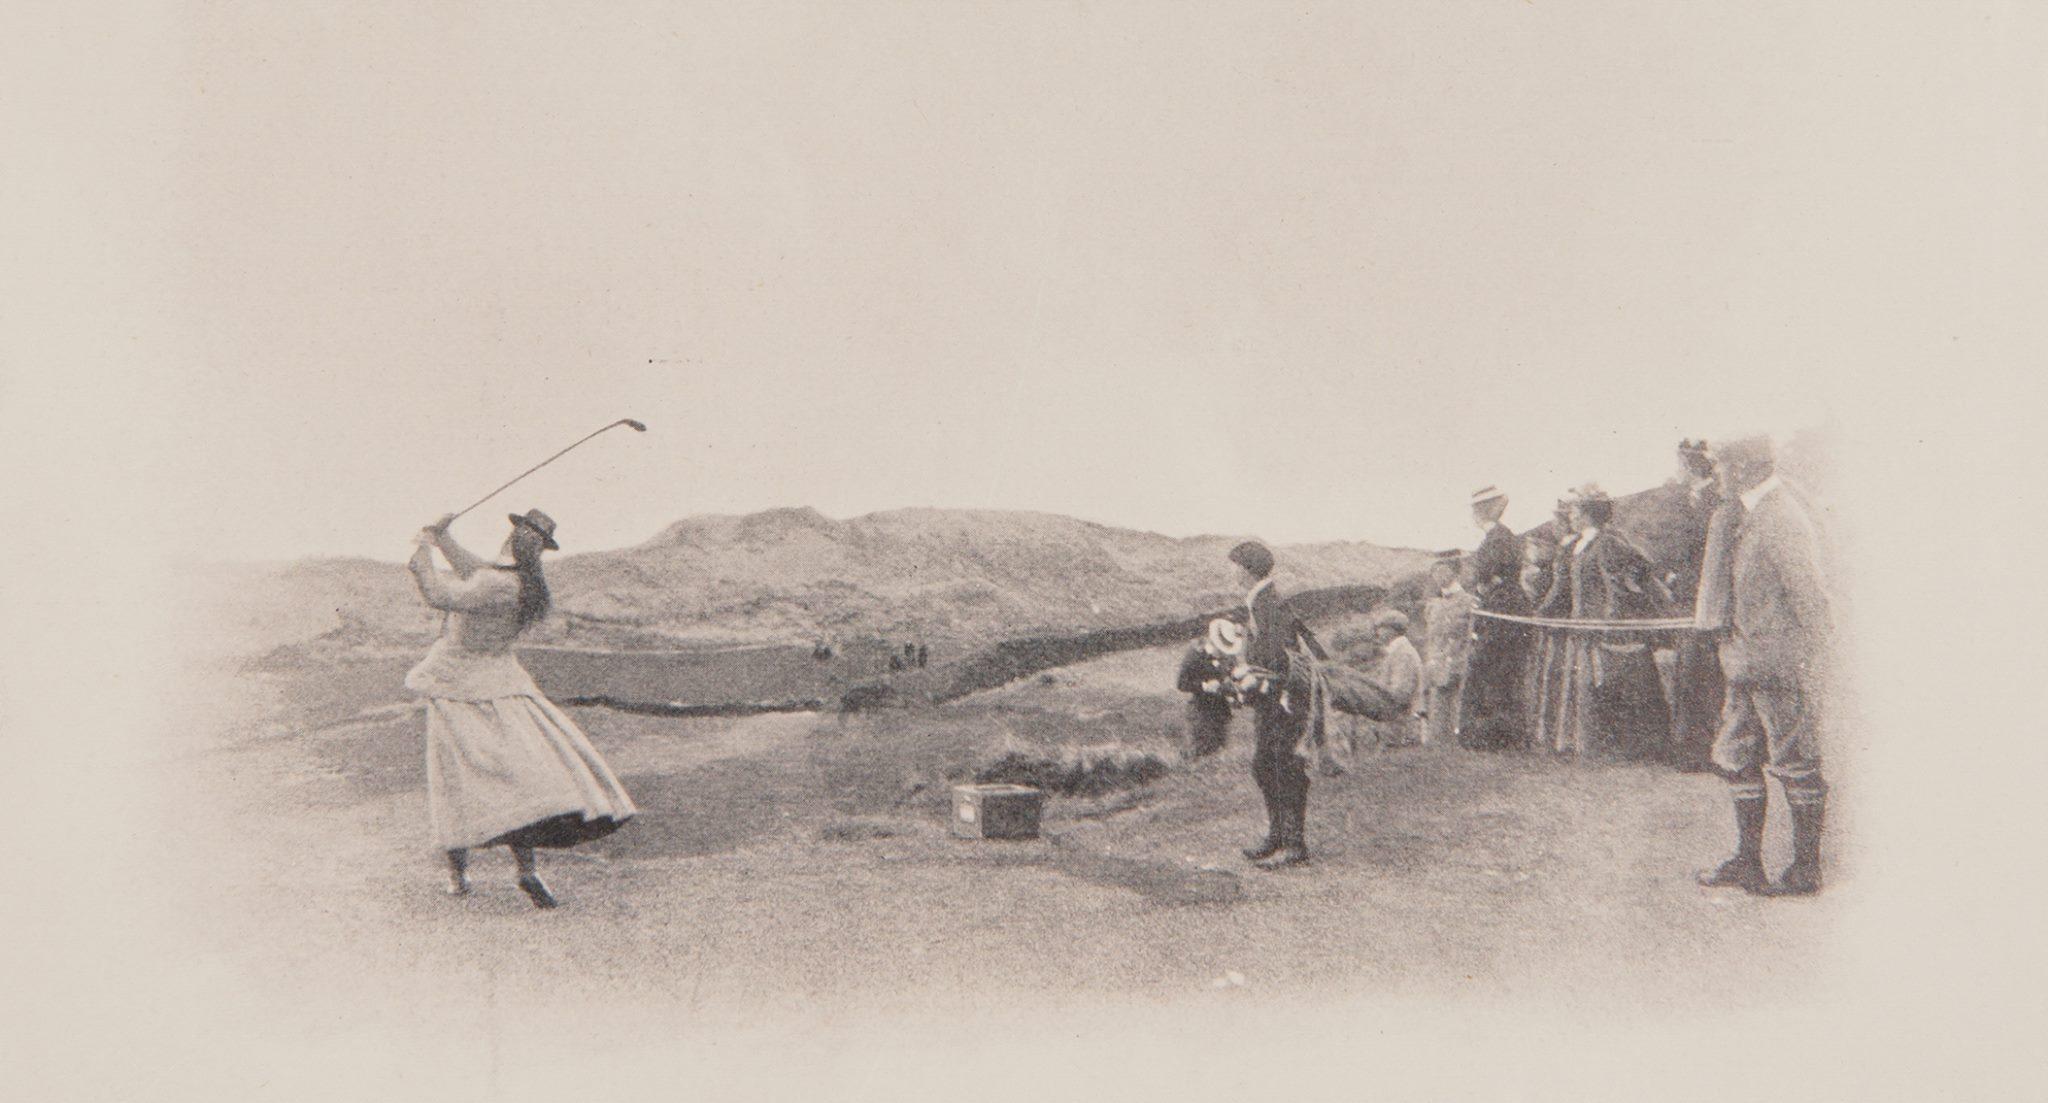 Vintage photo of golfer Mary hazlet 1899 taking a swing